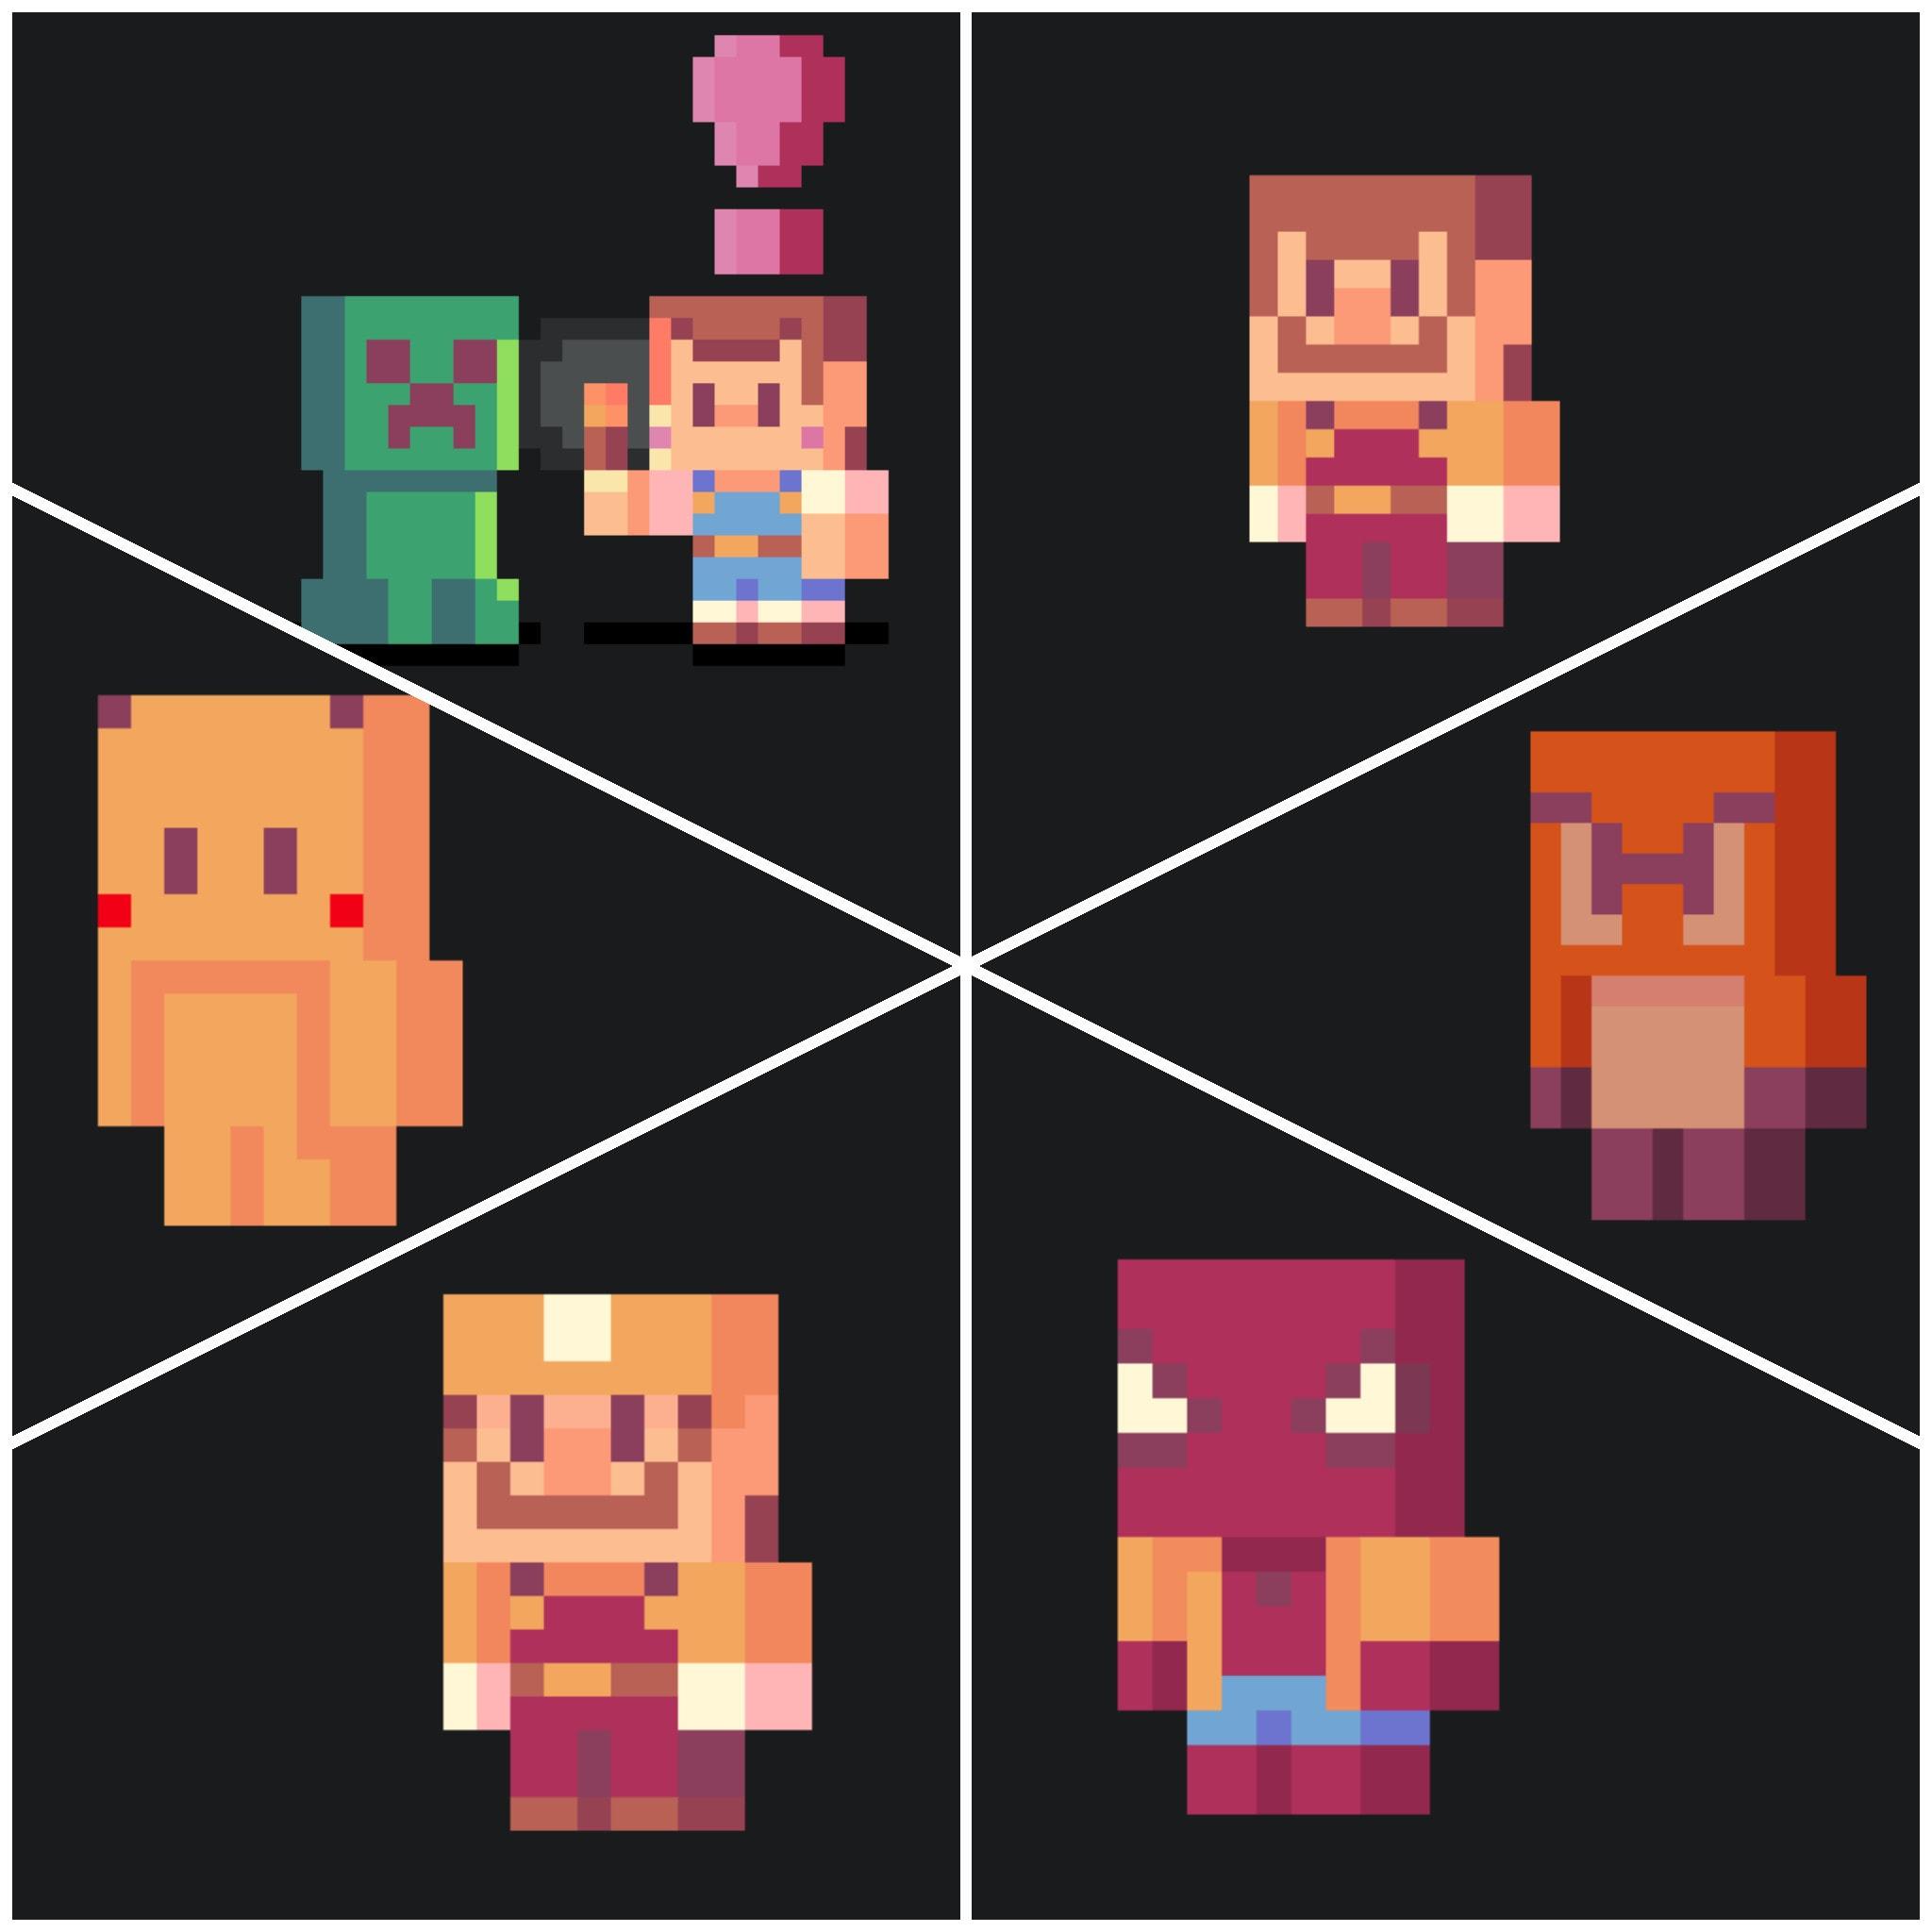 Make A Custom Minecraft Skin Plus Pixel Art Illustration By Enriqueyan